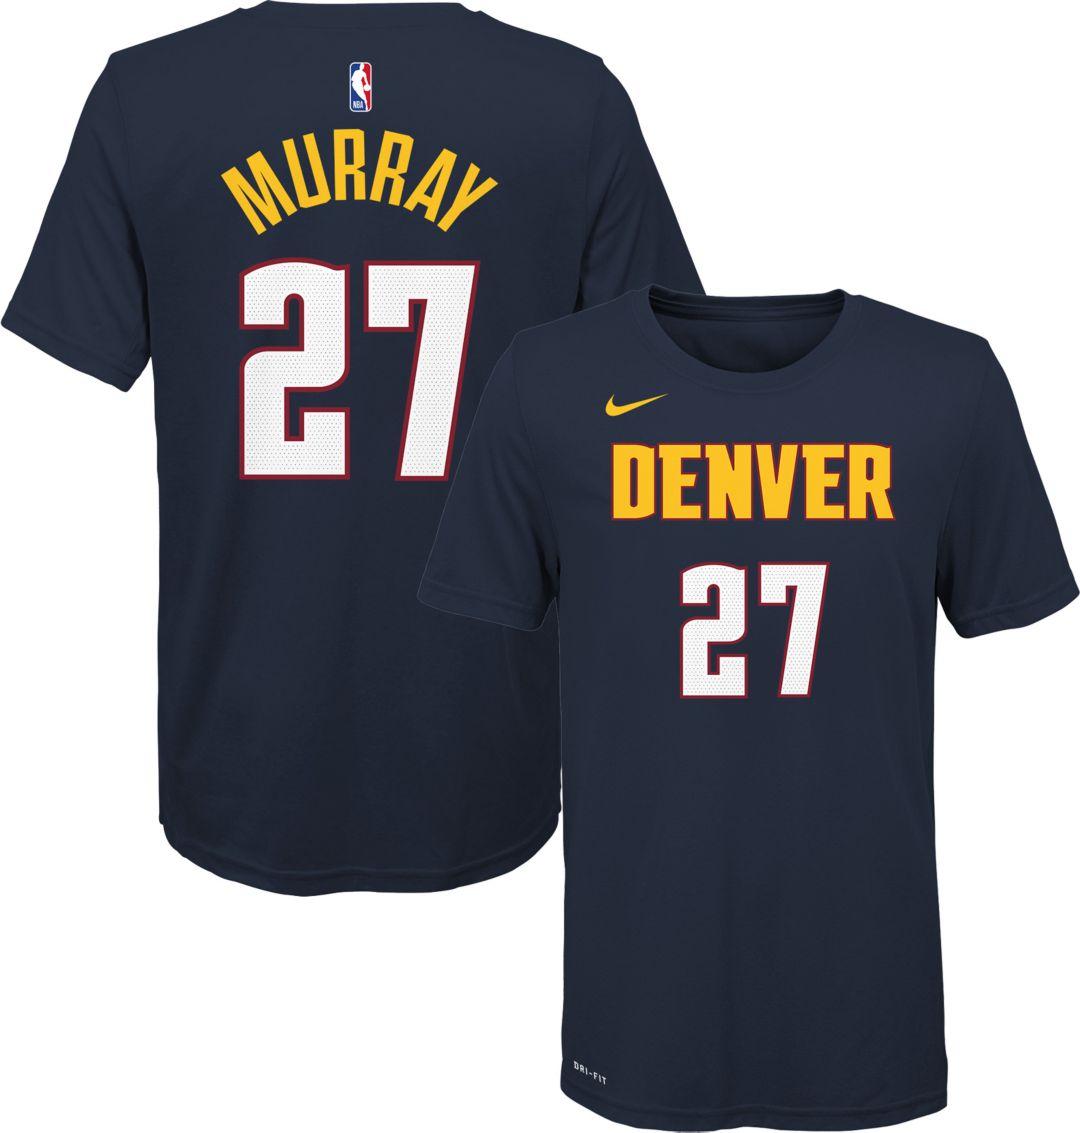 best sneakers 44b40 fbbd9 Nike Youth Denver Nuggets Jamal Murray #27 Dri-FIT Navy T-Shirt